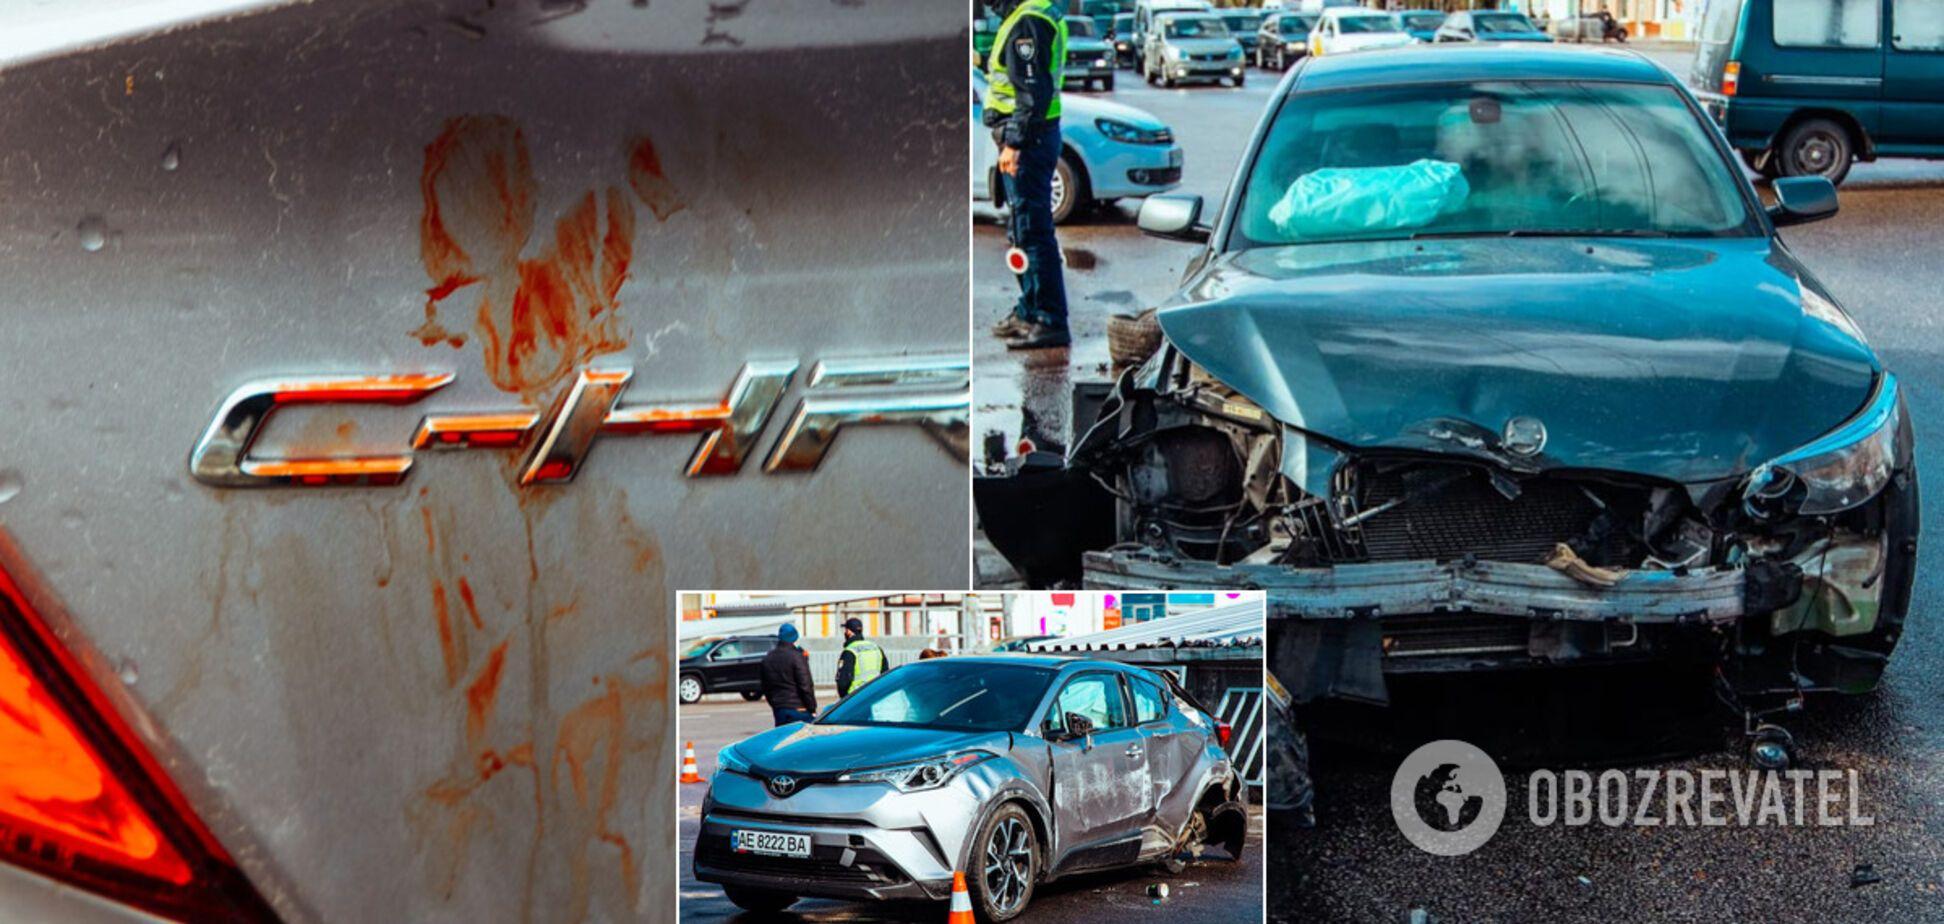 Машина 'всмятку': в Днепре произошло ДТП с пострадавшими. Фото